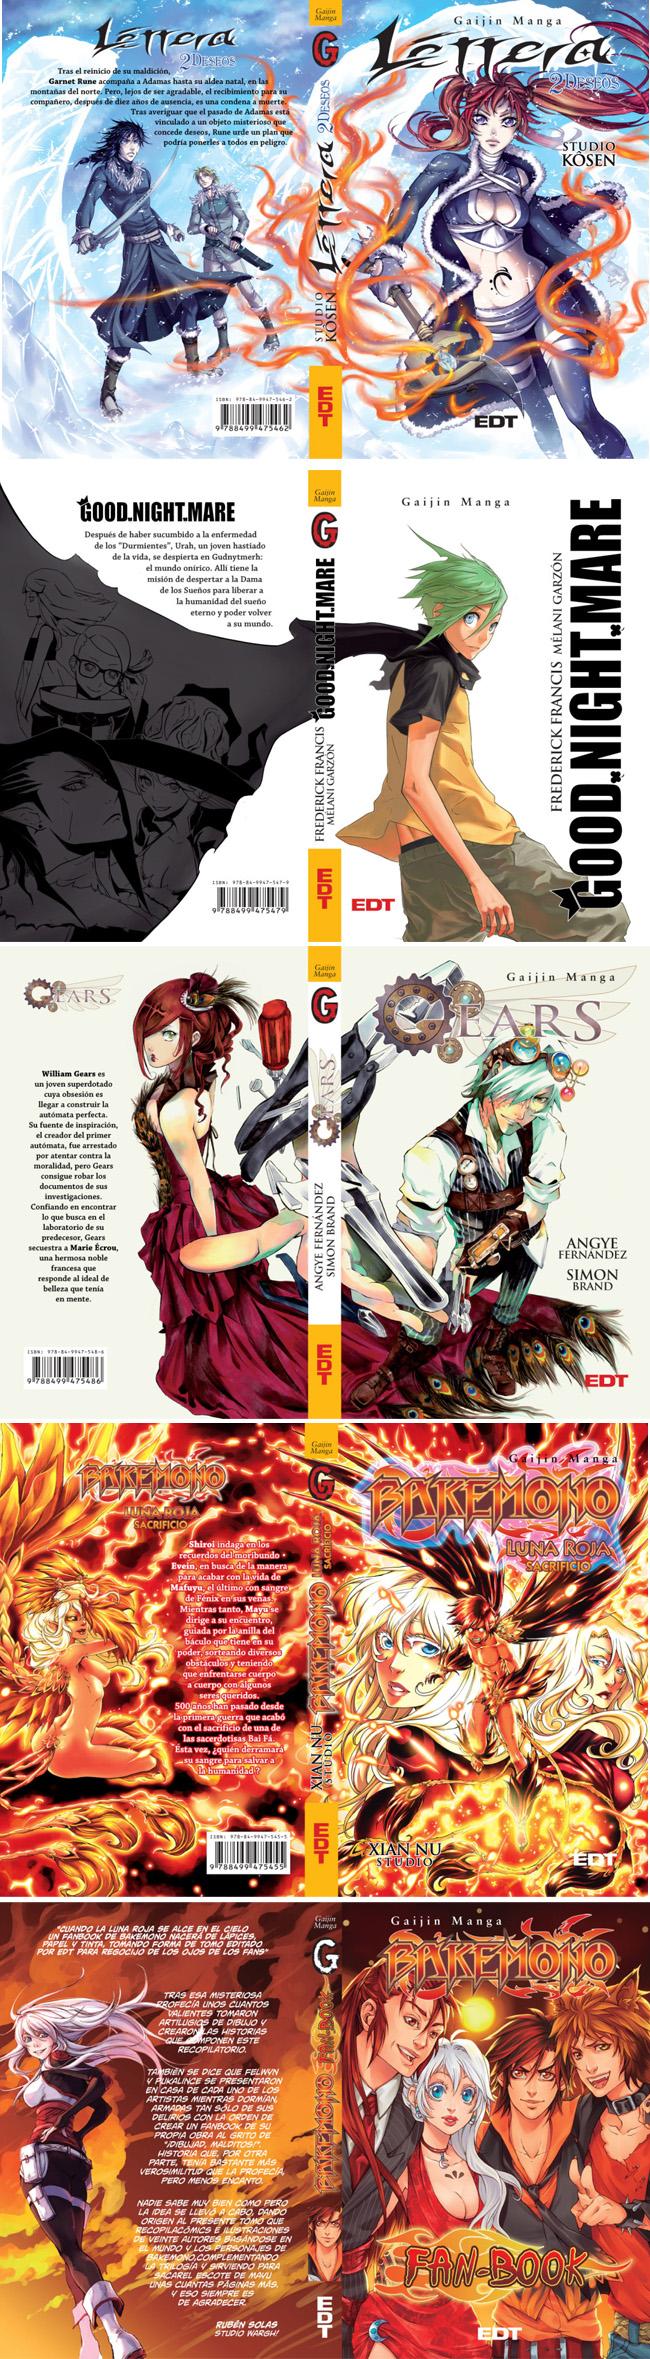 Gaijin-Manga-Salon-Barcelona-Madrid-Kosen-Diana-Fernandez-AcademiaC10